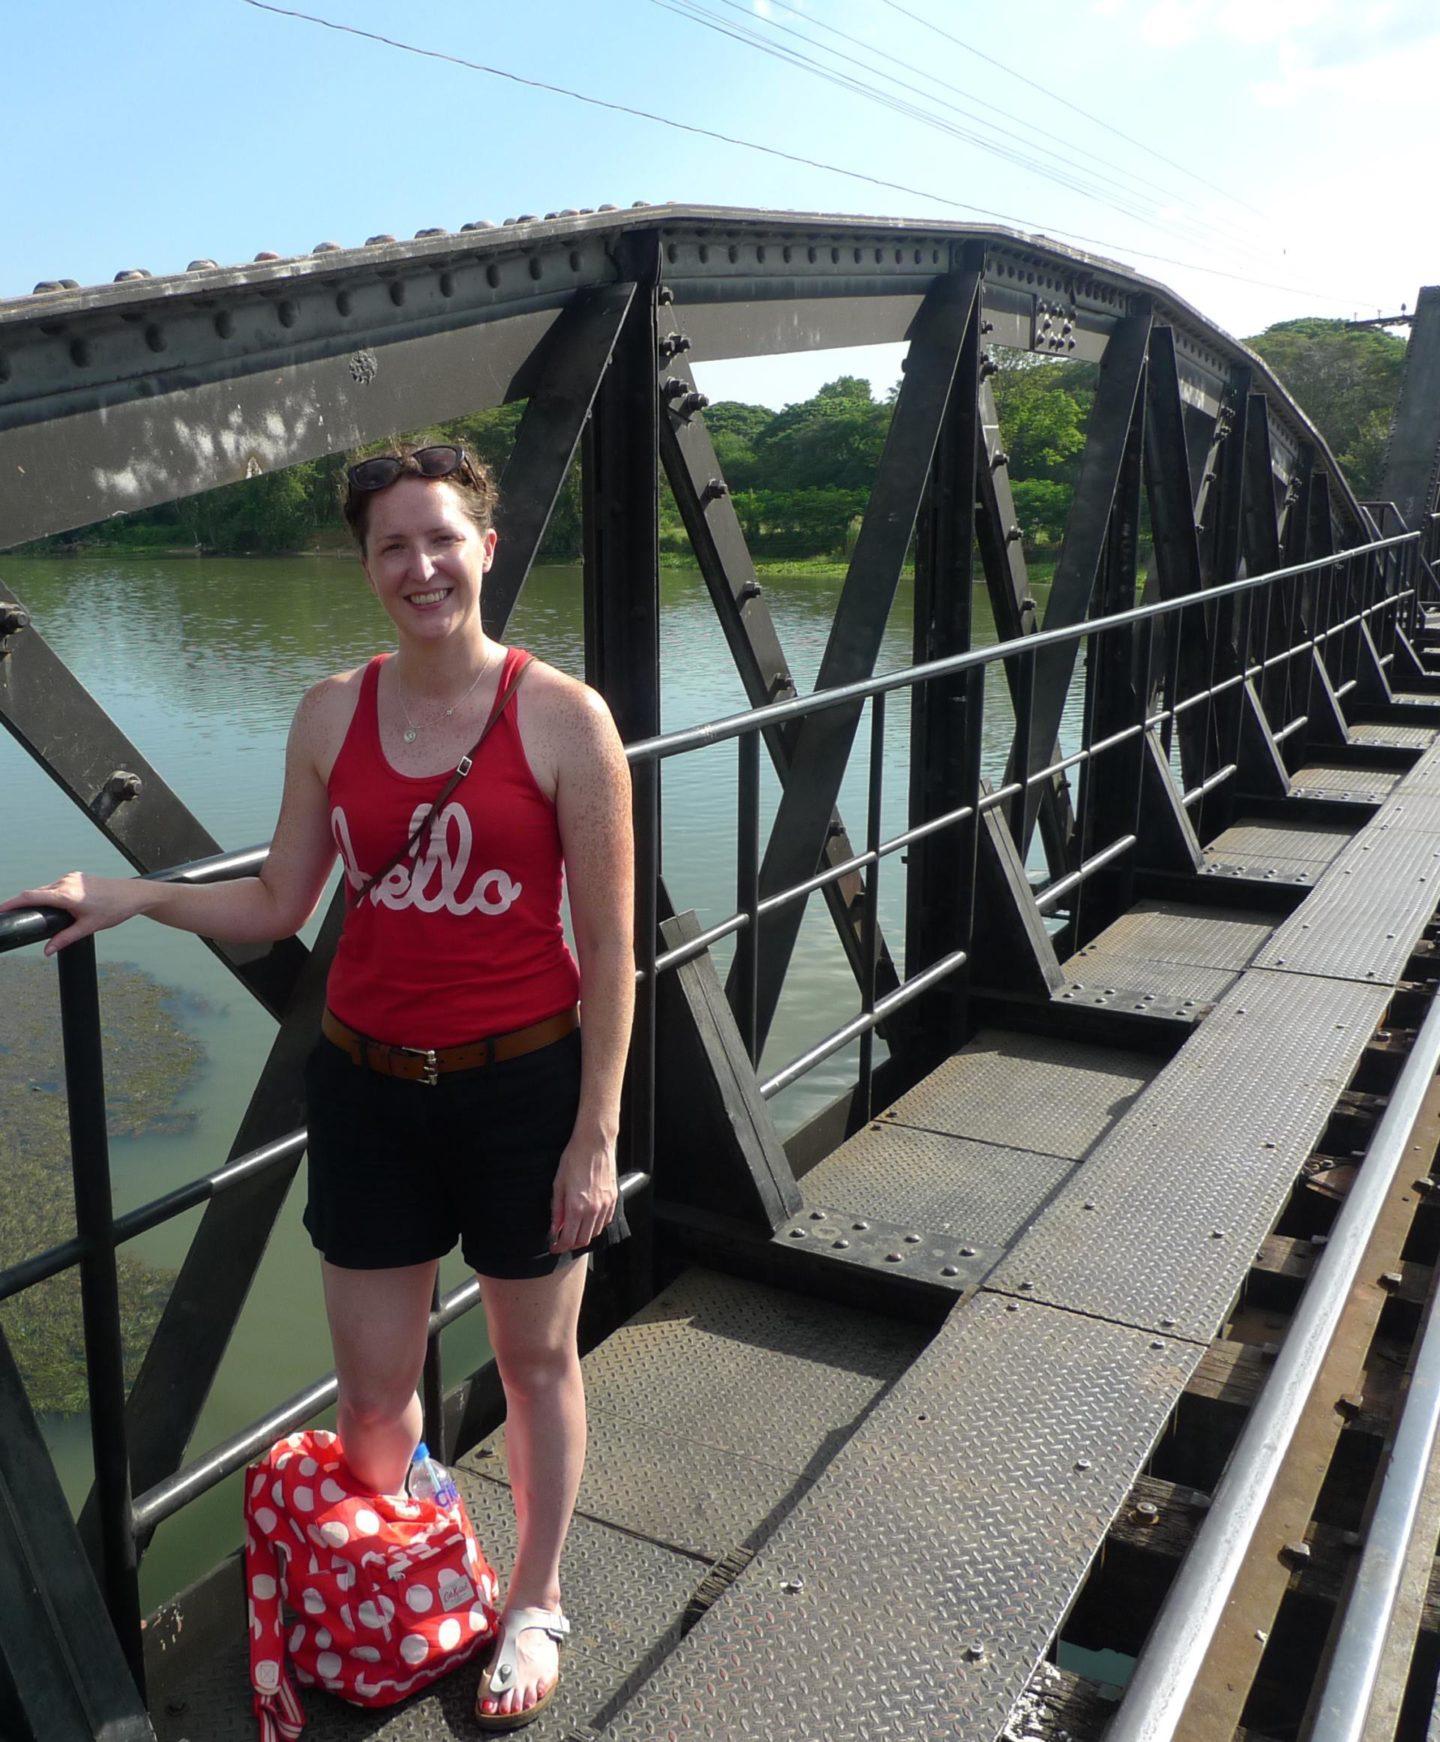 Cake Lady on the bridge over the River Kwai, Kanchaburi, Thailand. November 2015